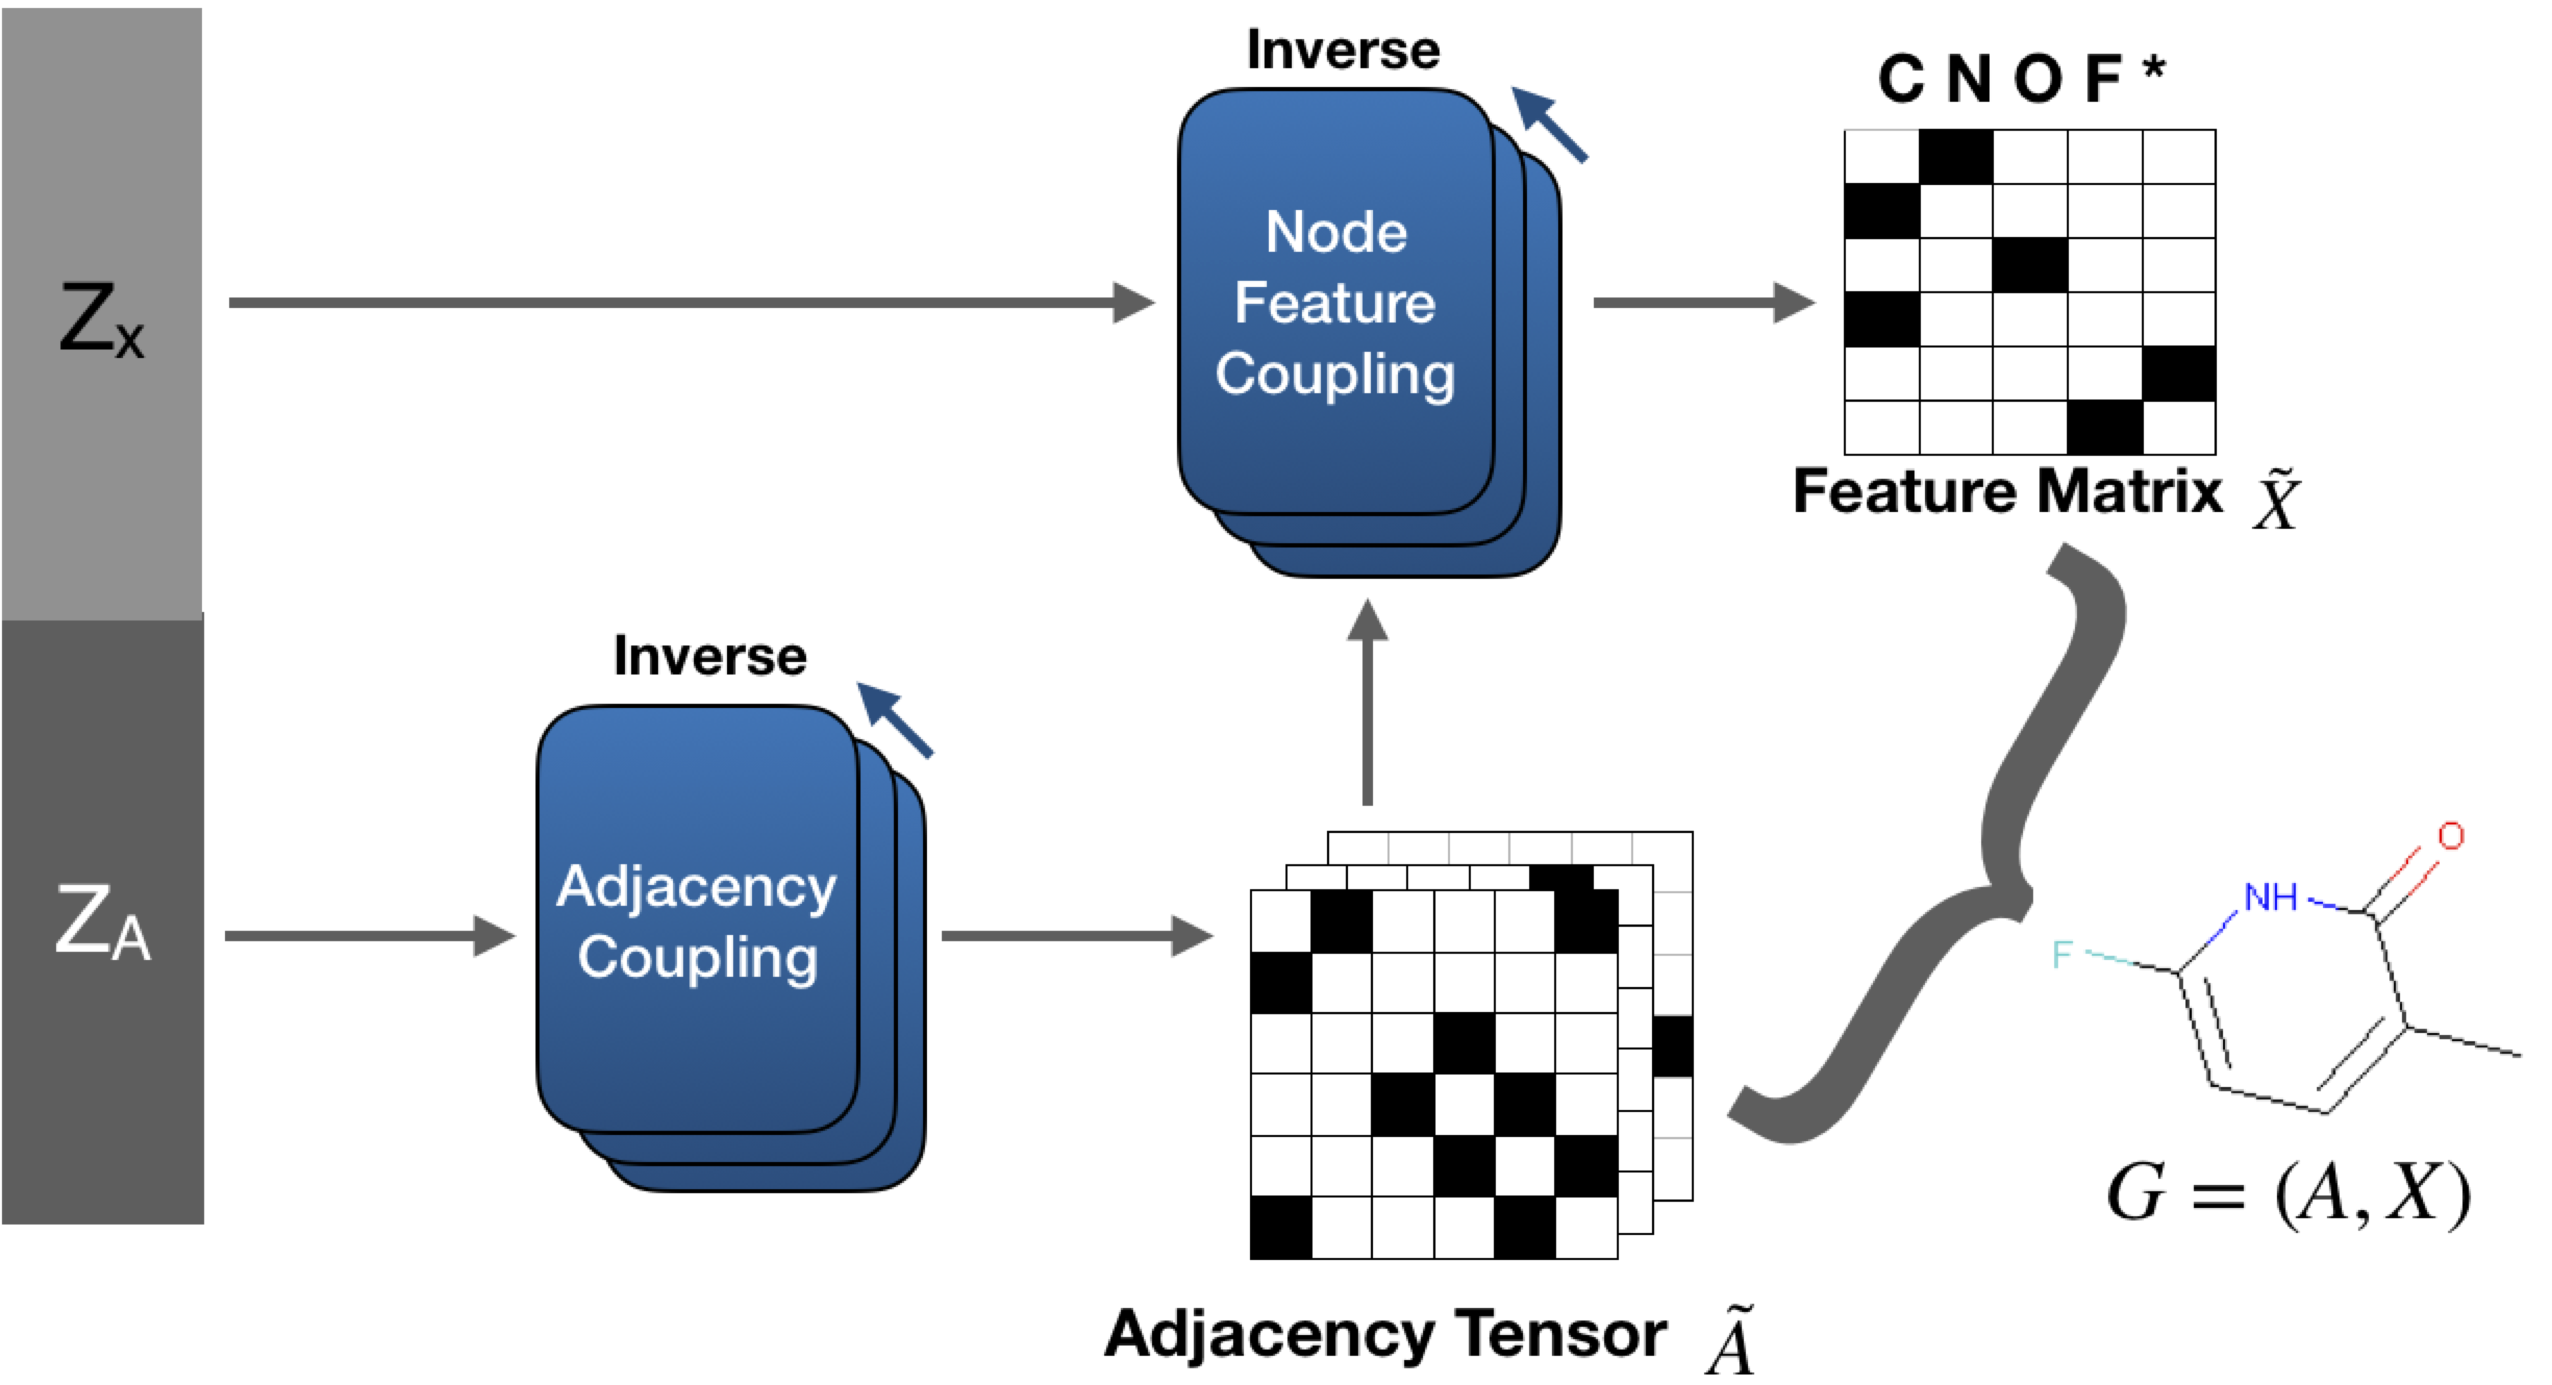 model_reverse